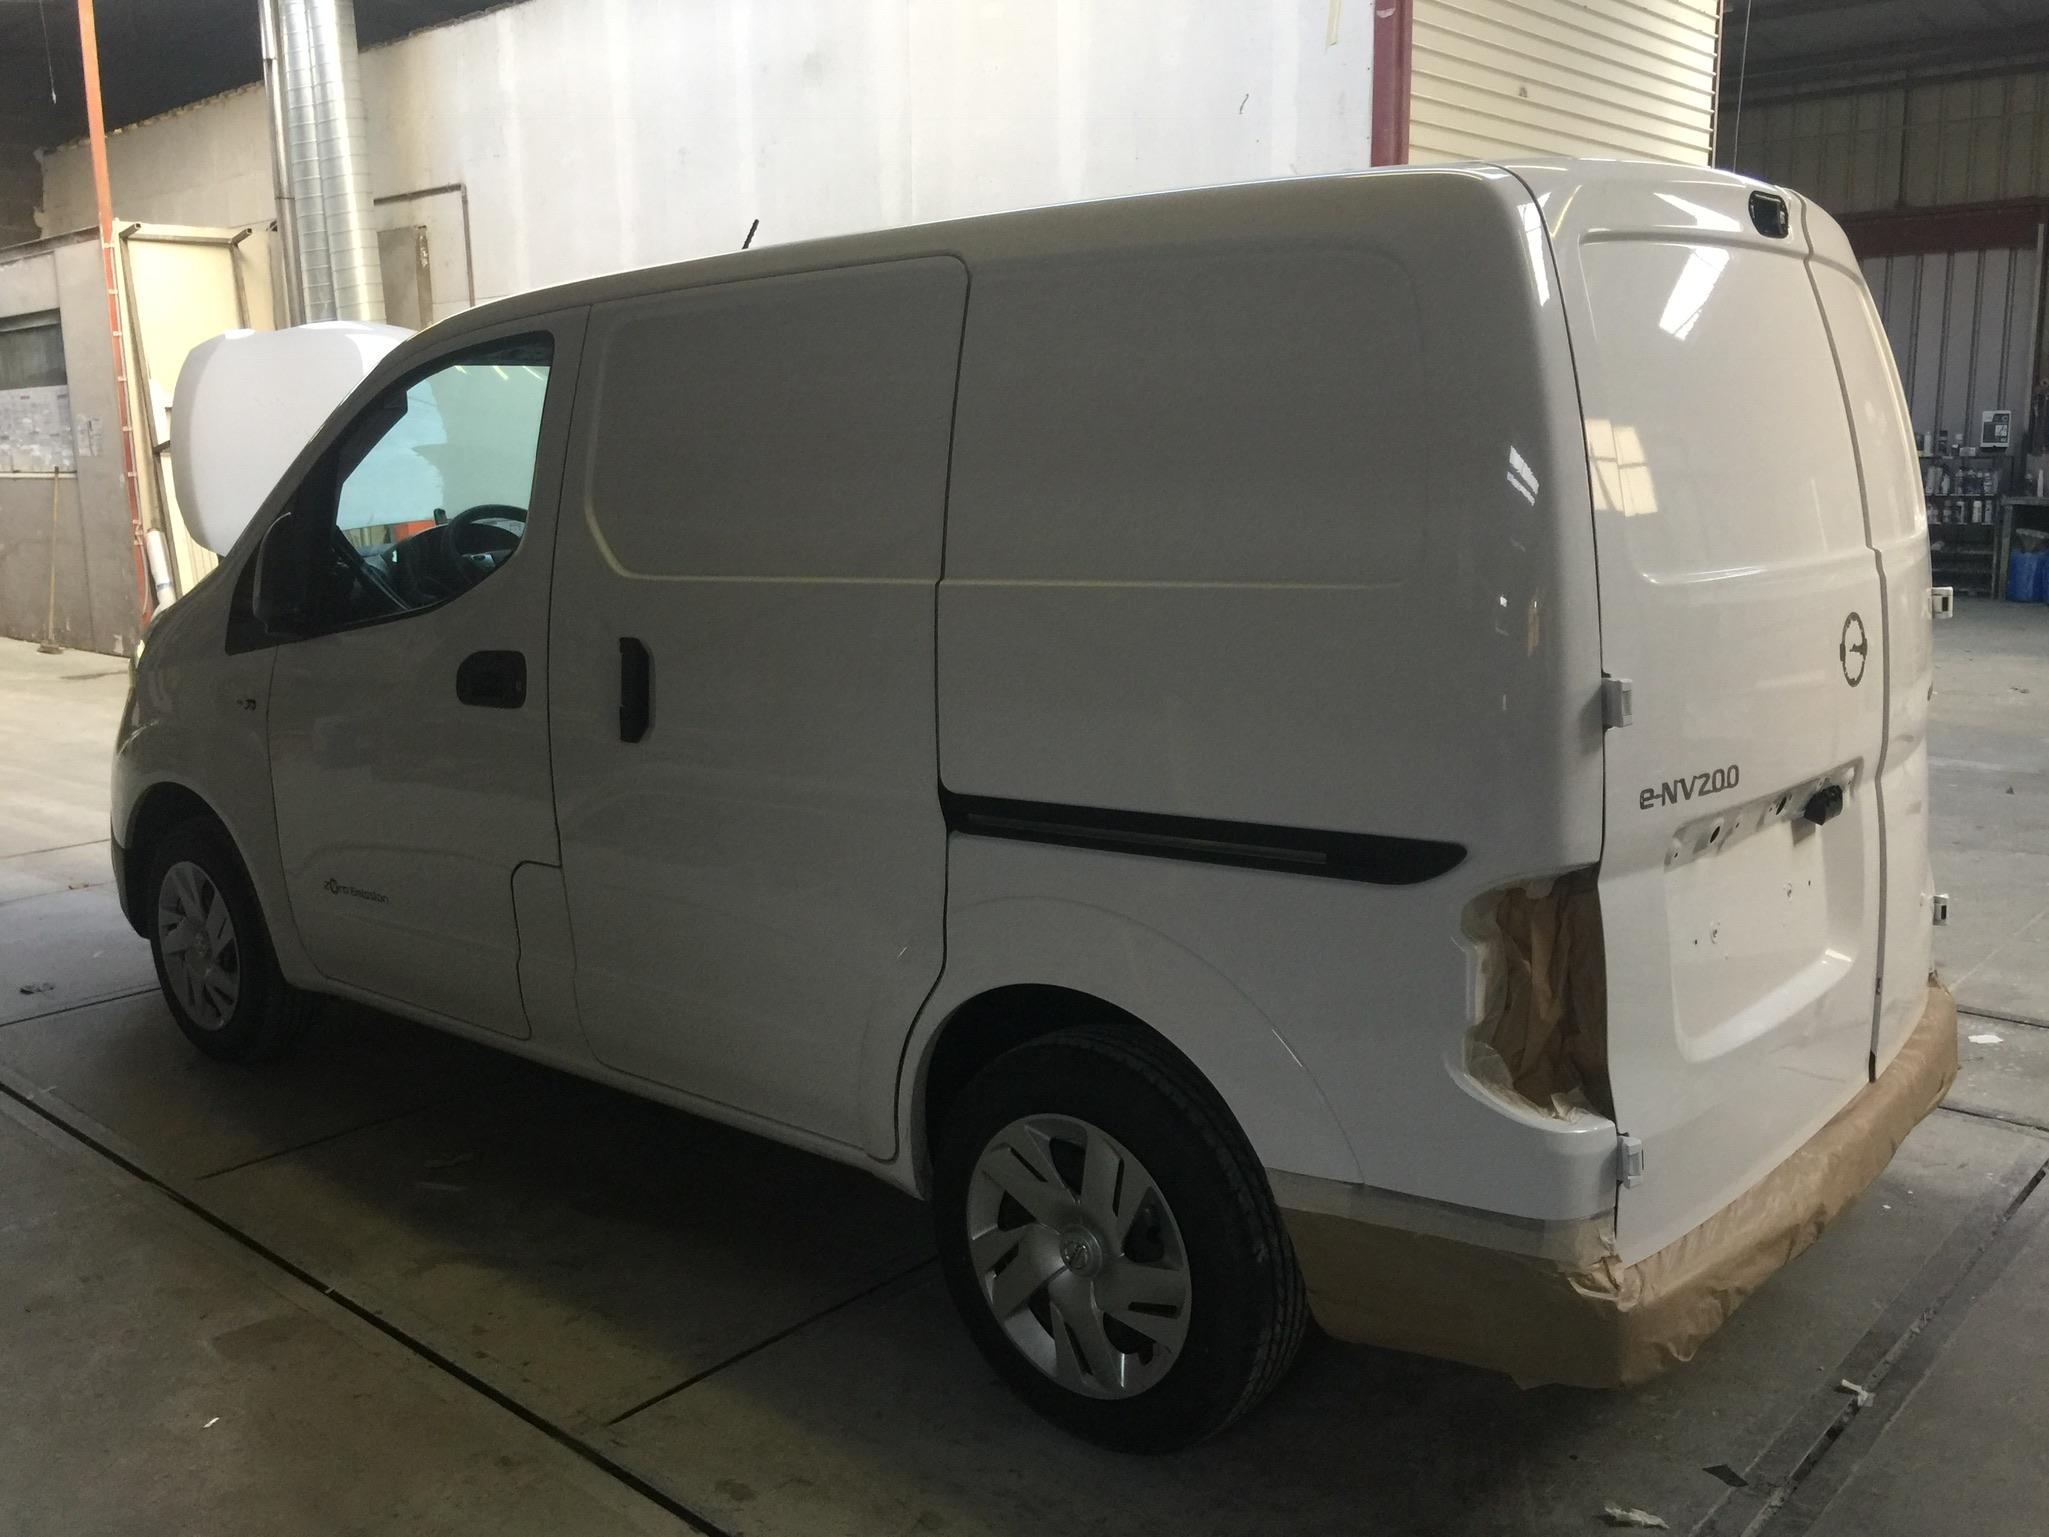 Nissan NV 200 - 100% Electrique